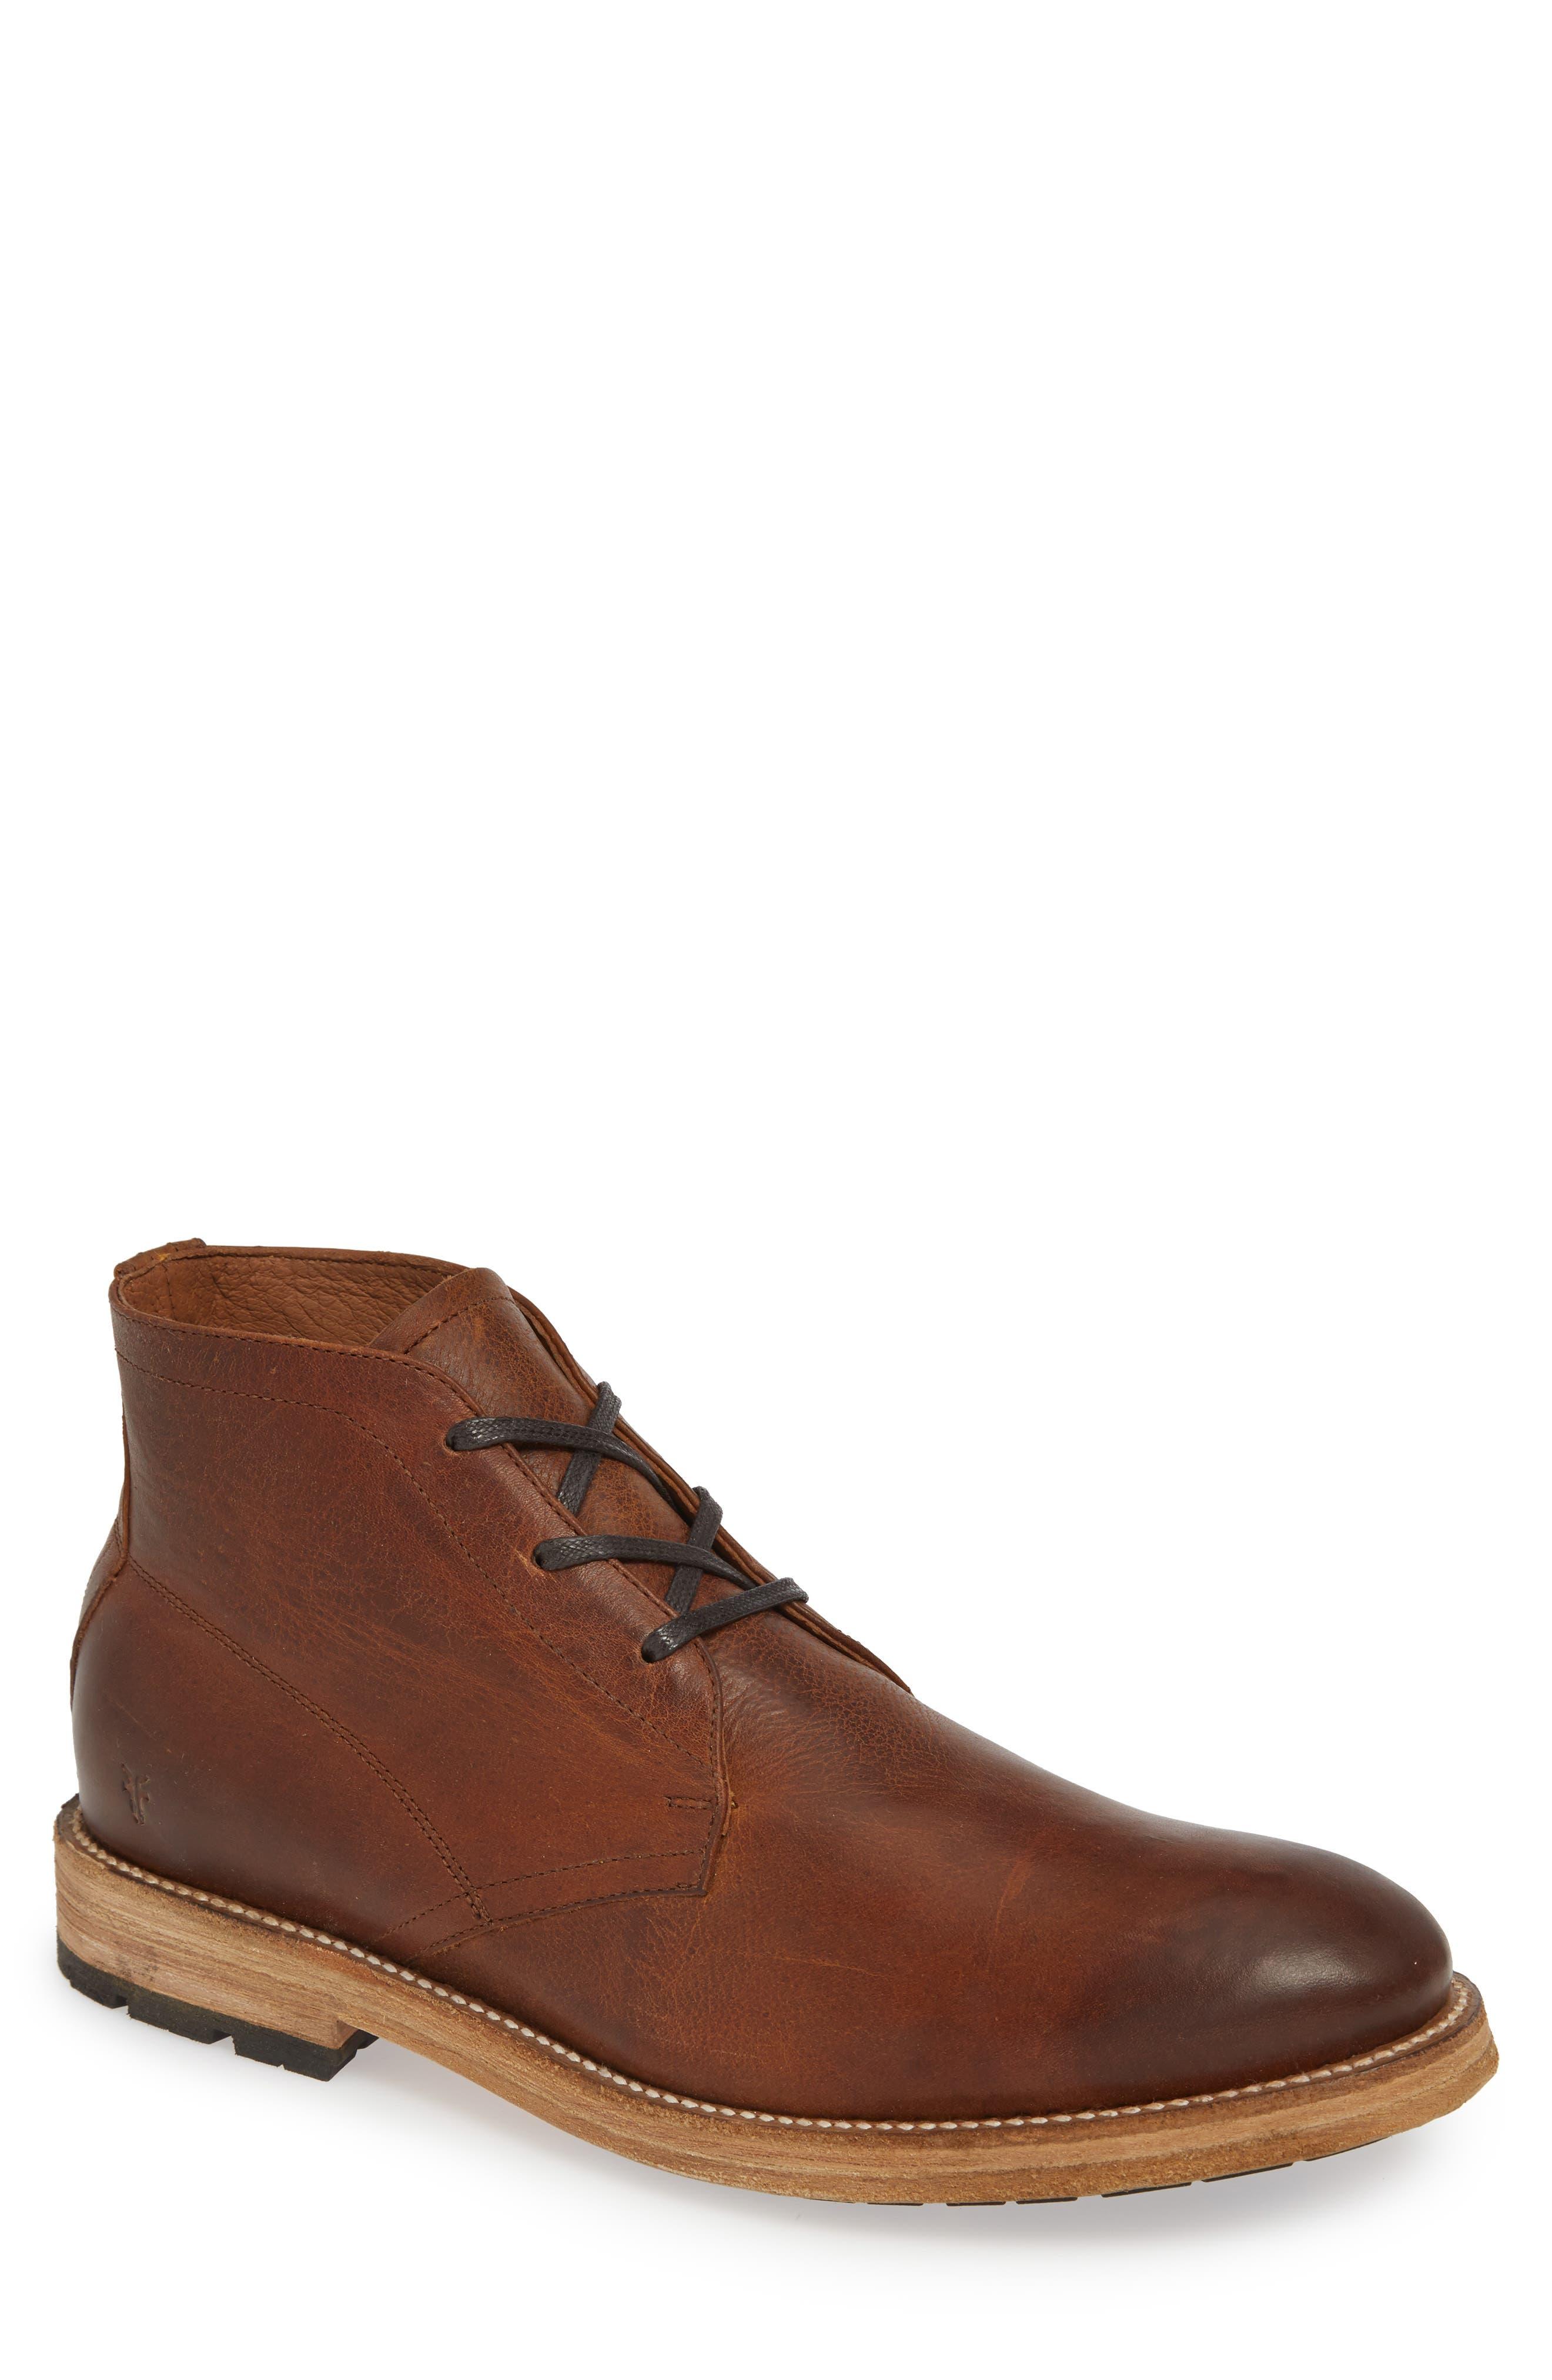 Frye Bowery Chukka Boot